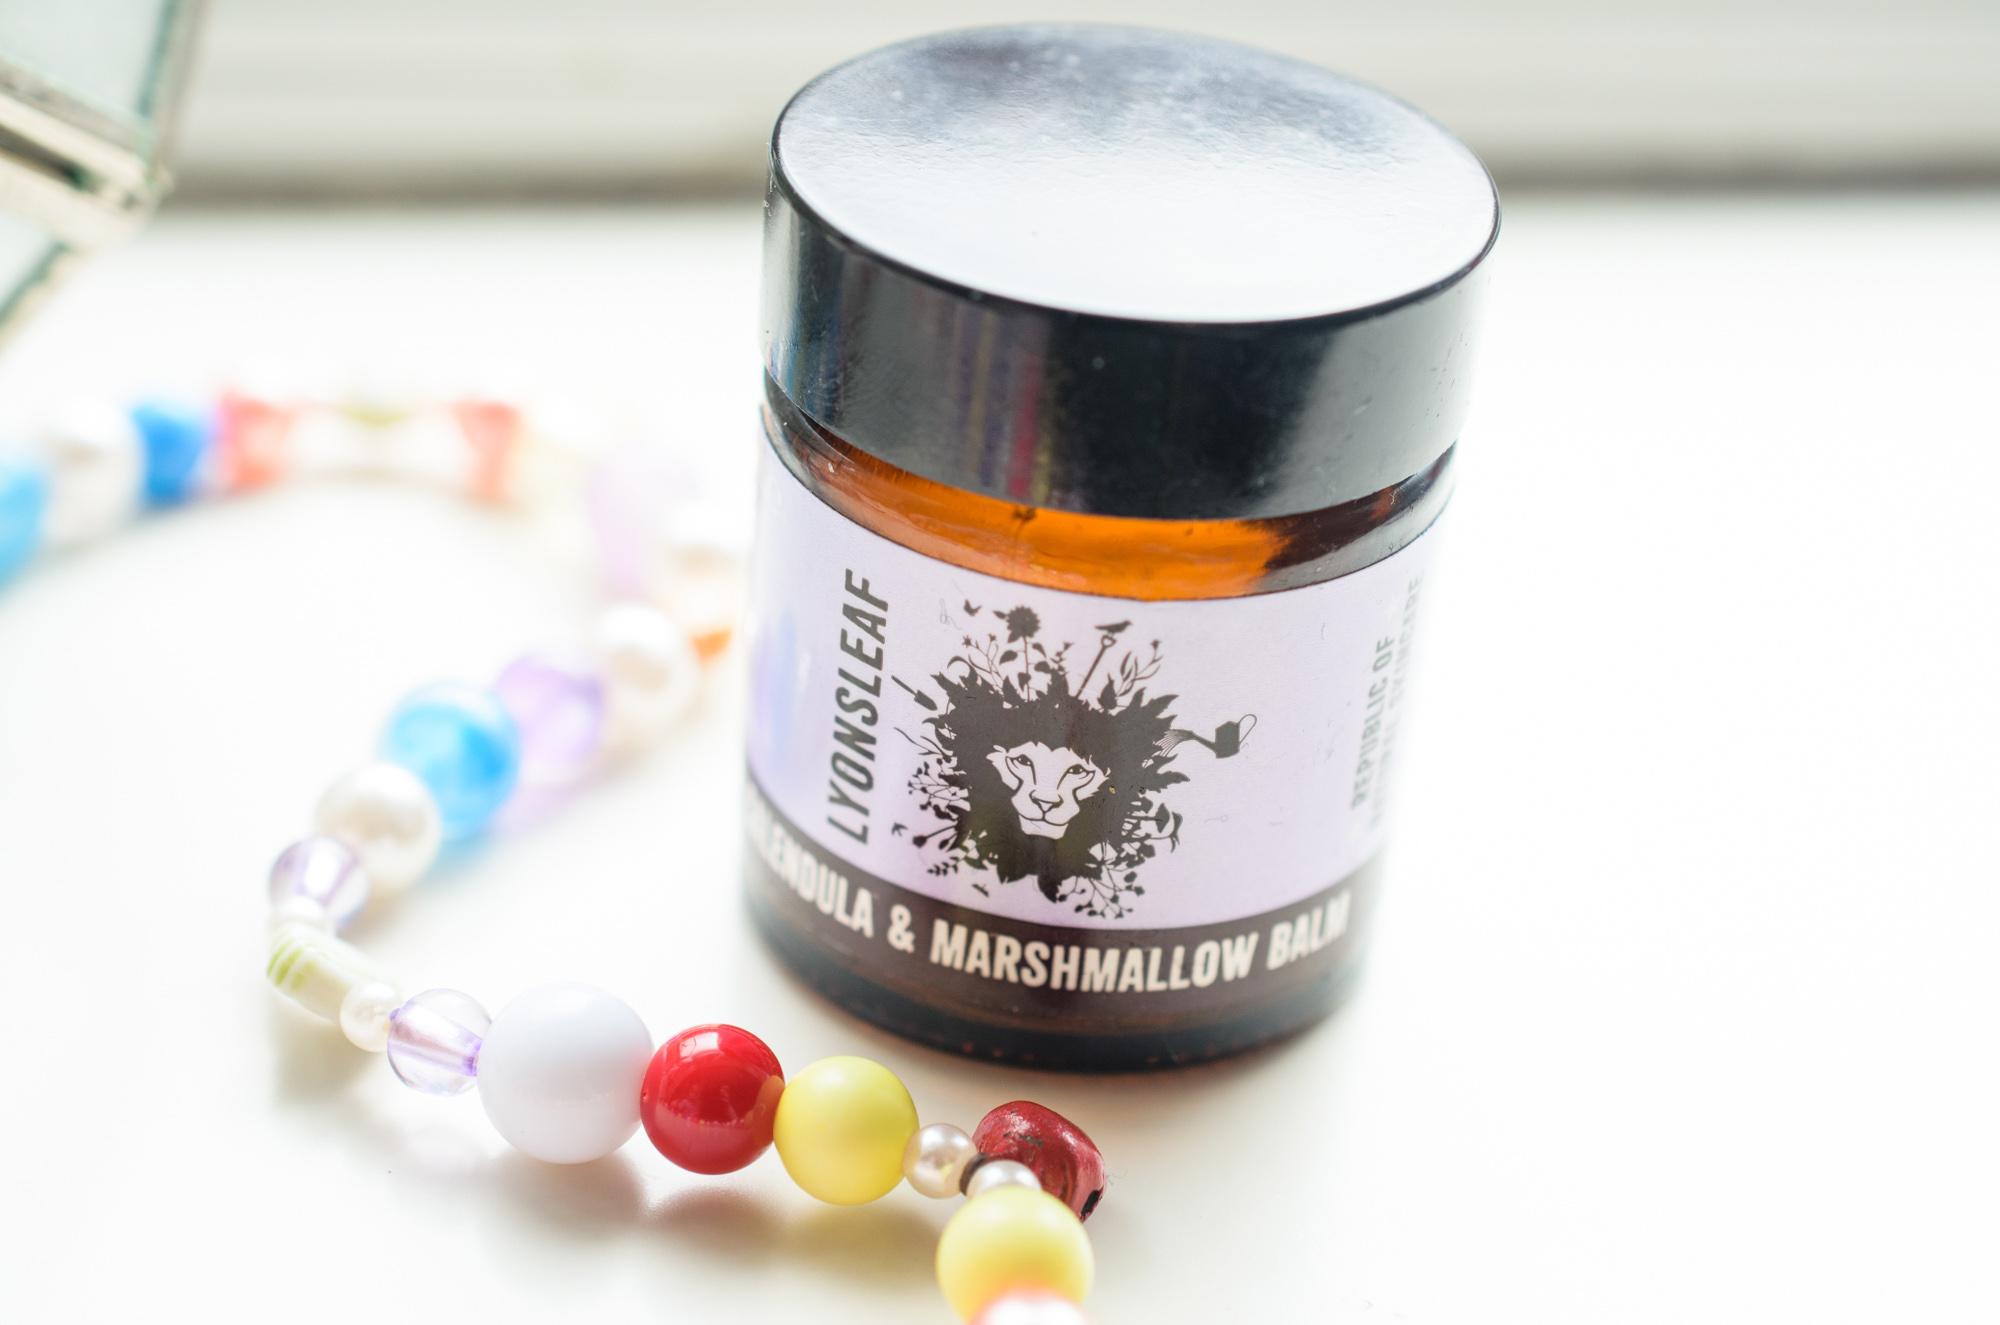 Lyonsleaf Calendula and Marshmallow Balm